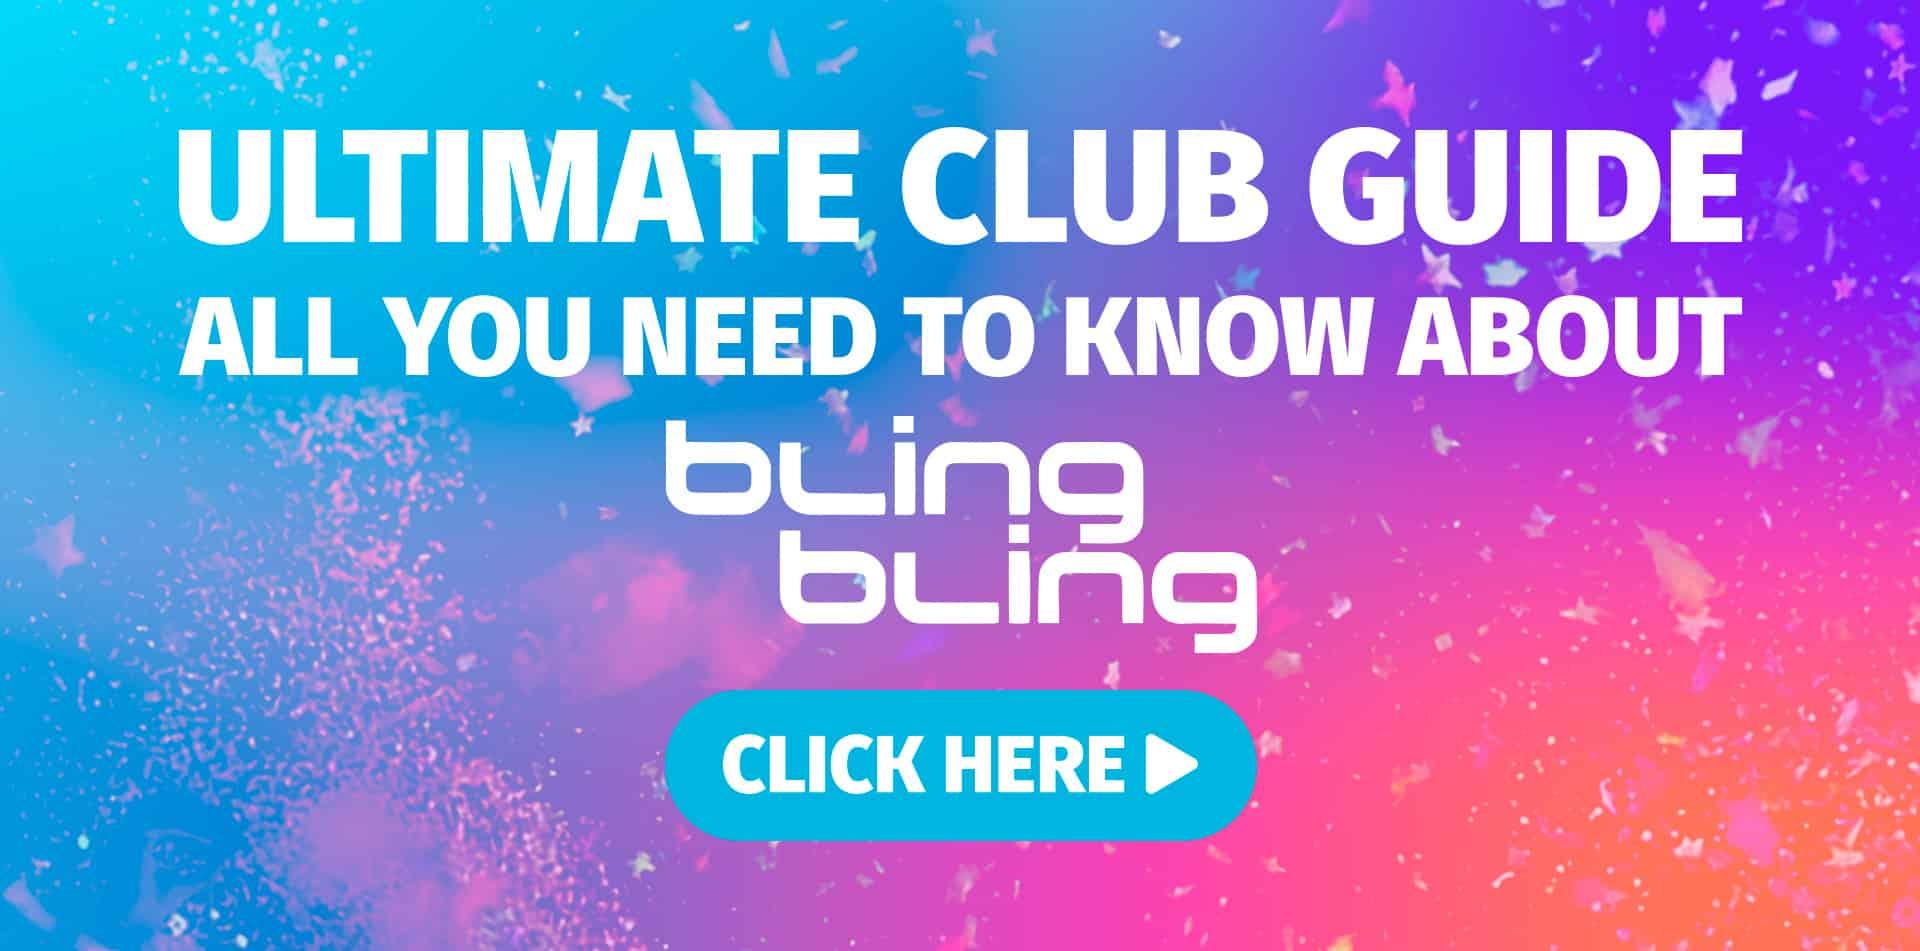 Ultimate Club Guide - Bling Bling Madrid